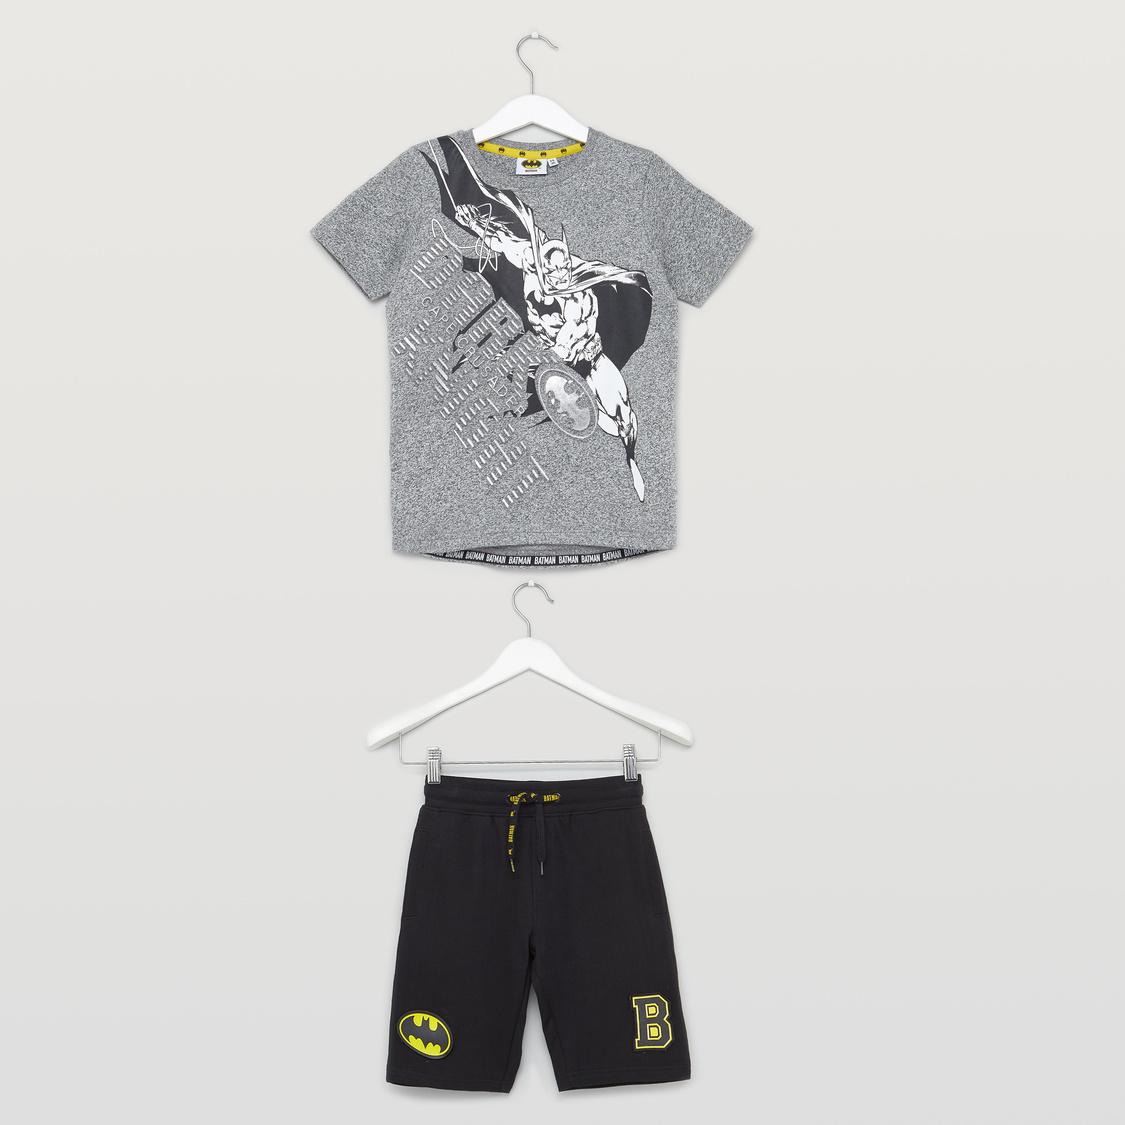 Batman Print T-shirt and Shorts Set